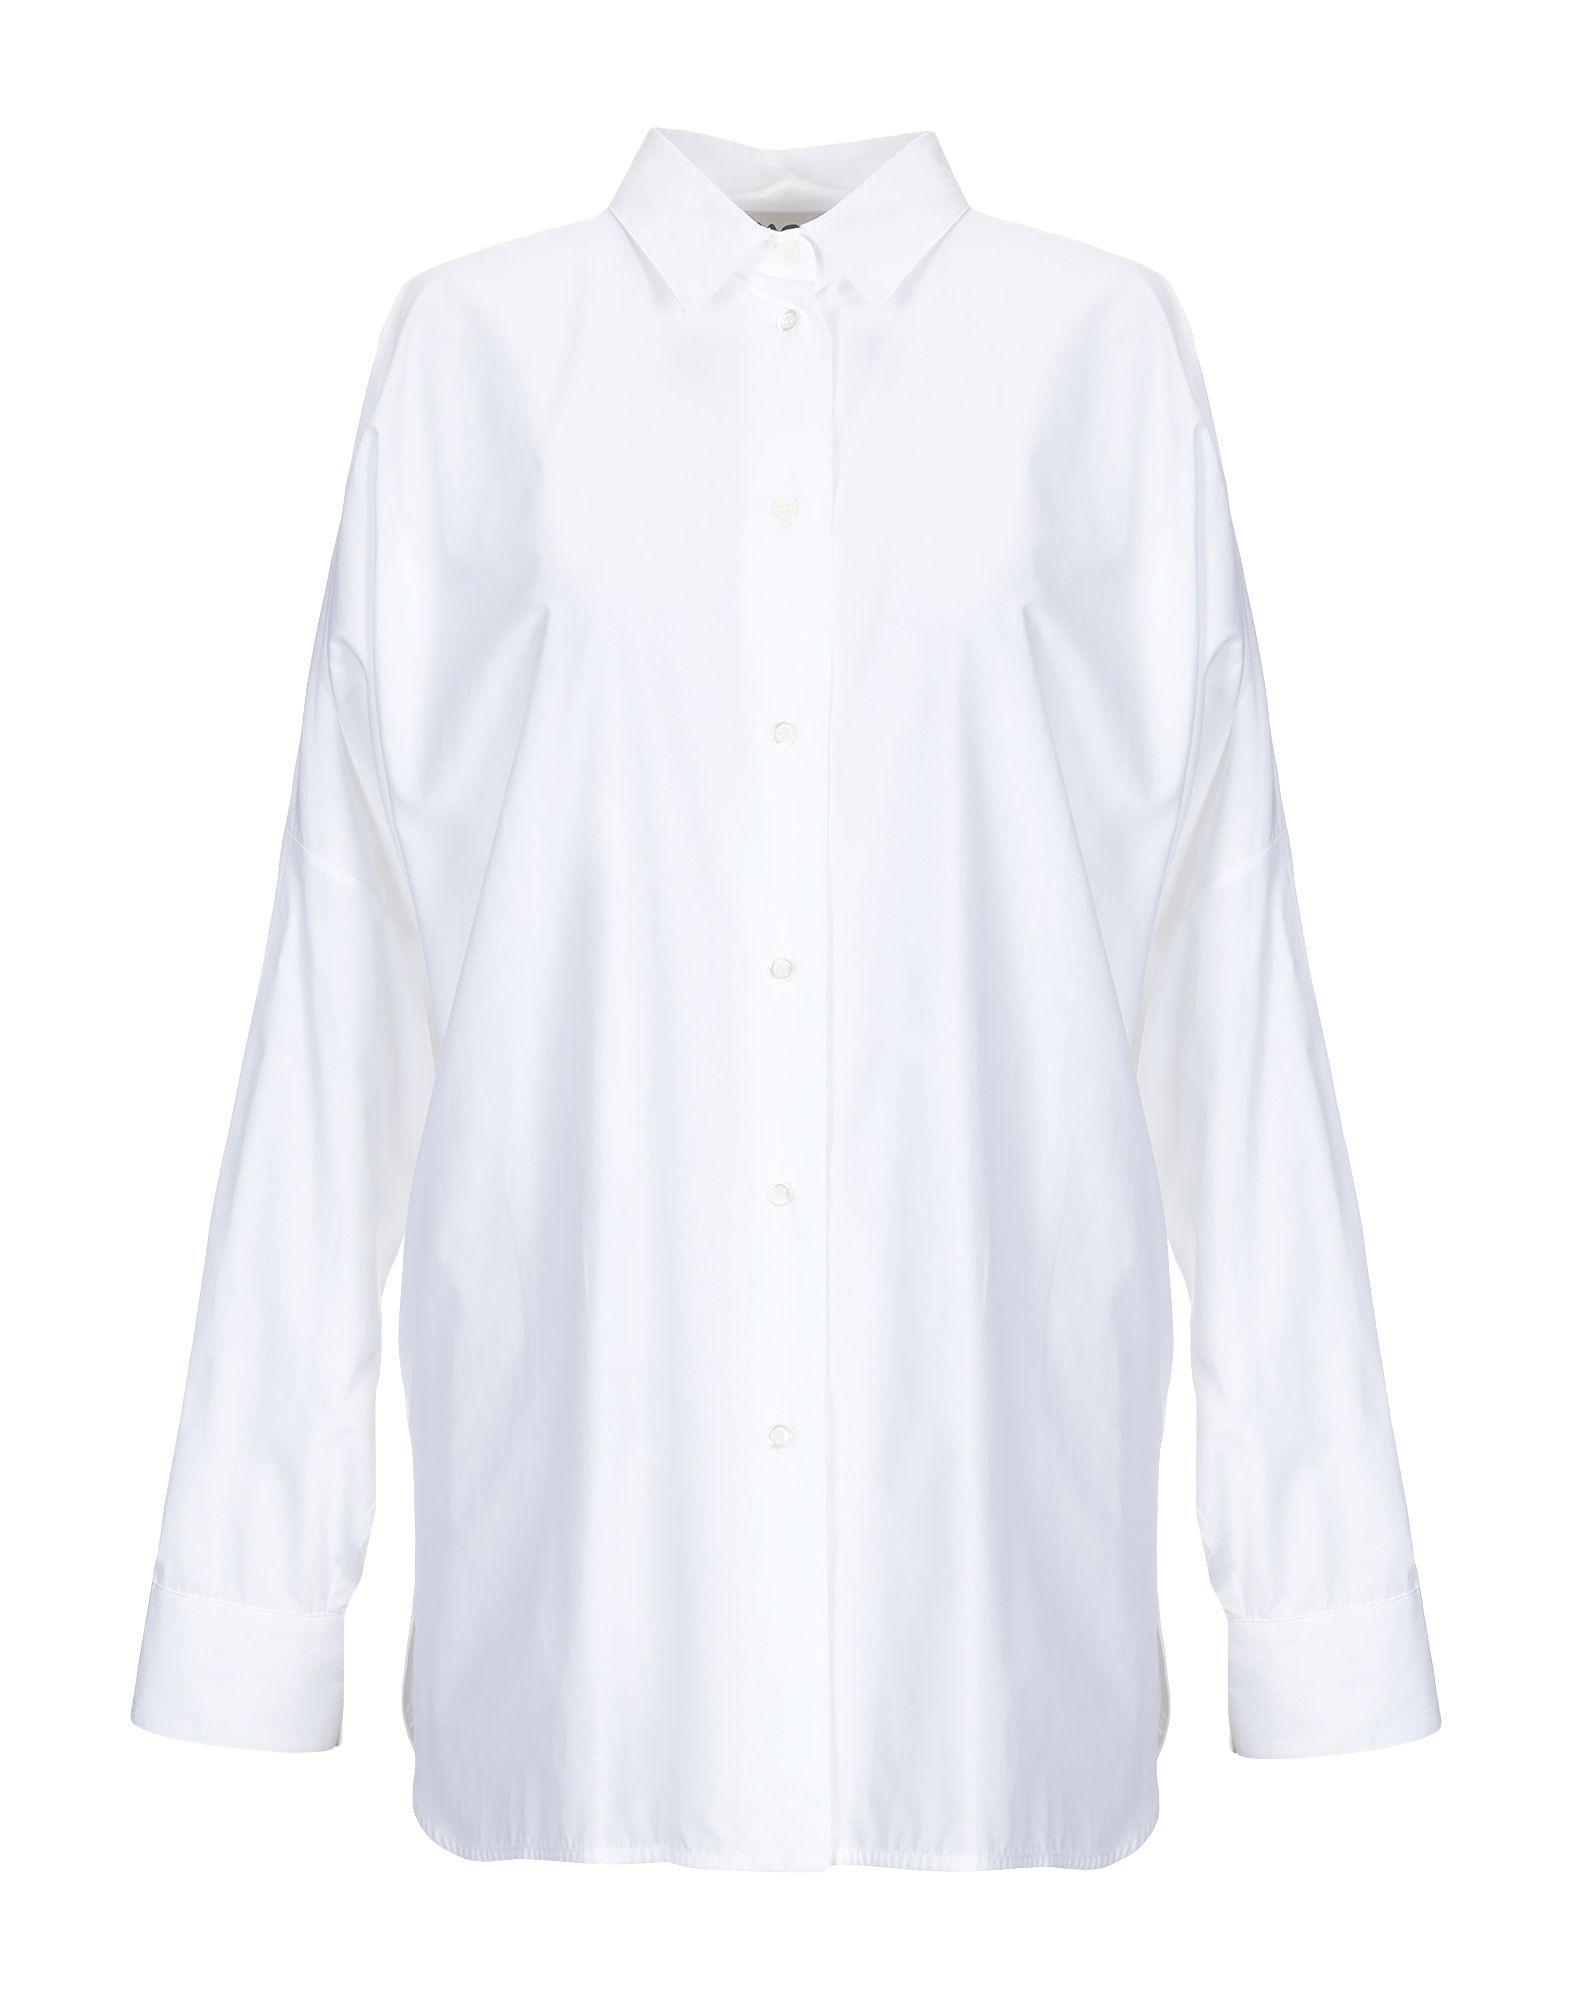 92d84c79 Lyst - Hache Shirt in White